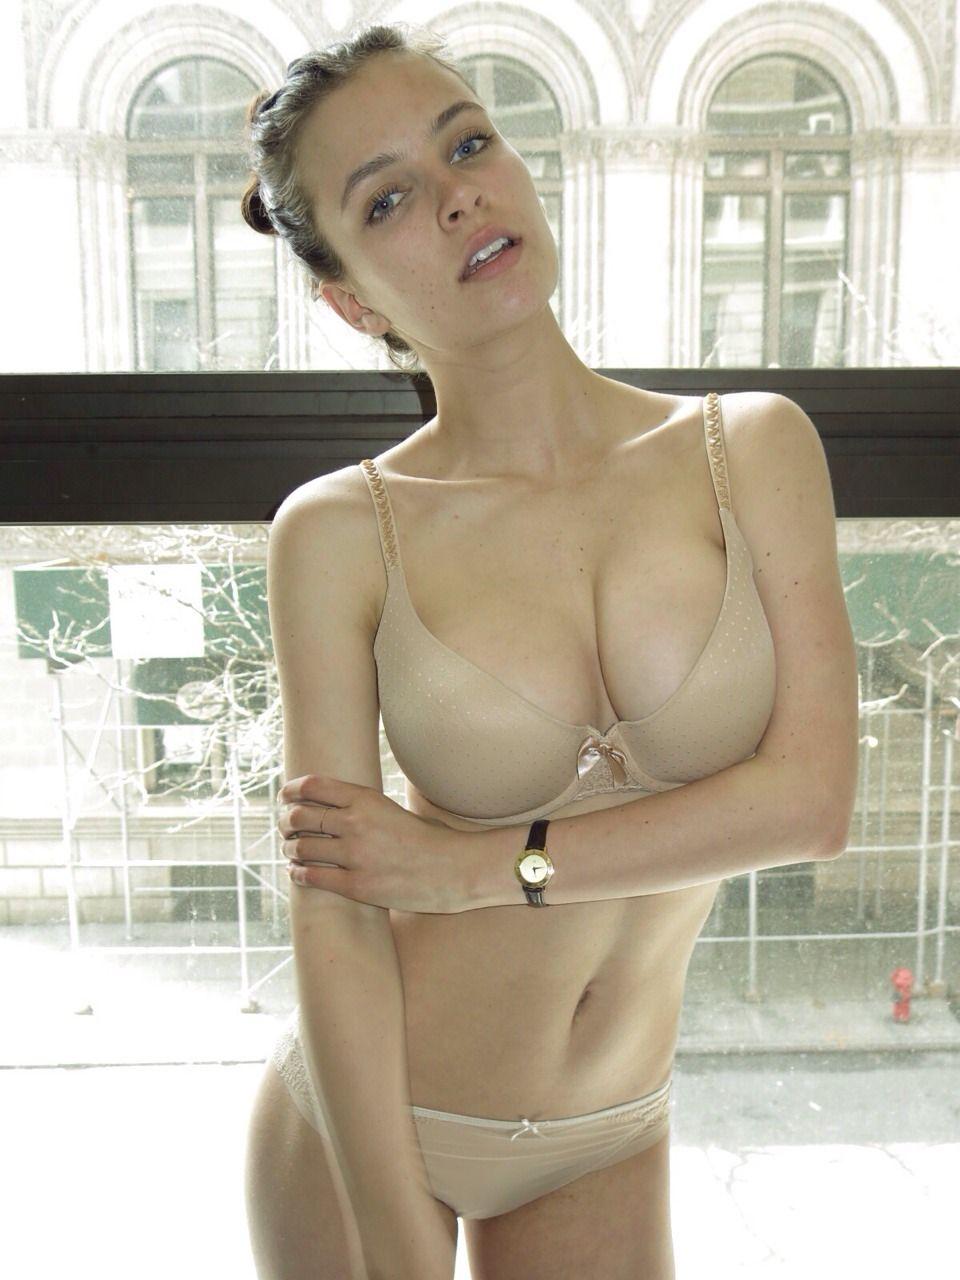 nude (81 photo), Pussy Celebrity image